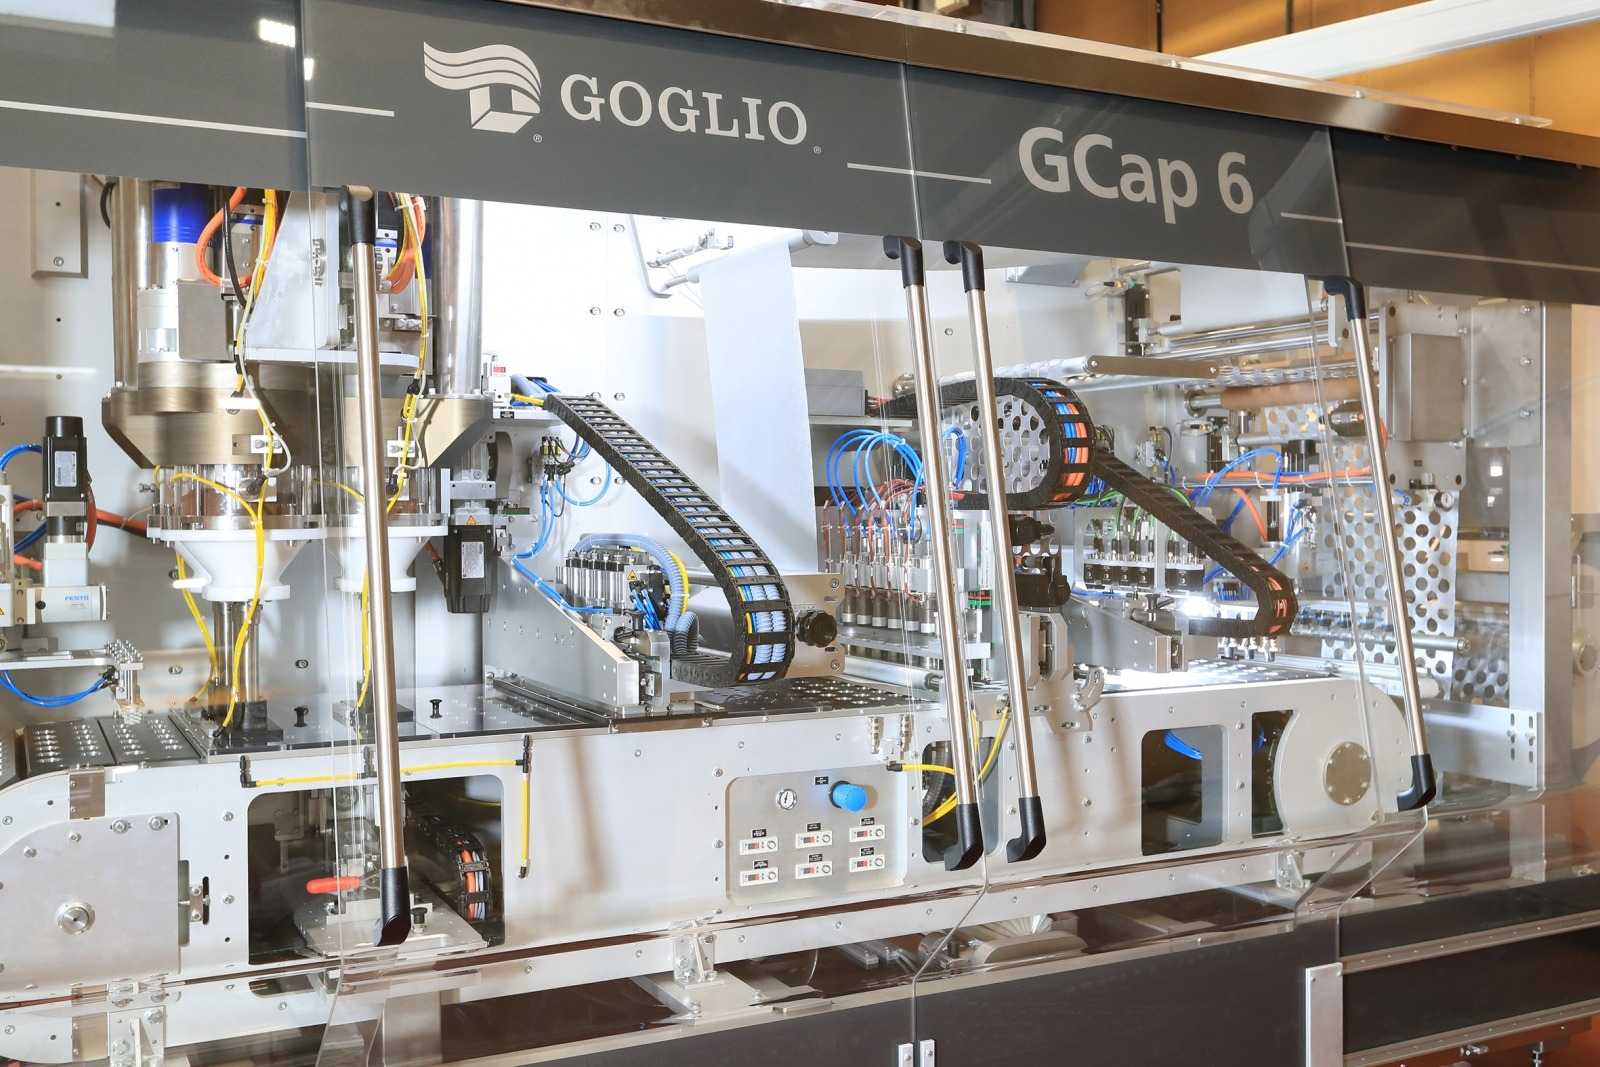 Goglio Gcap Servitization IOT